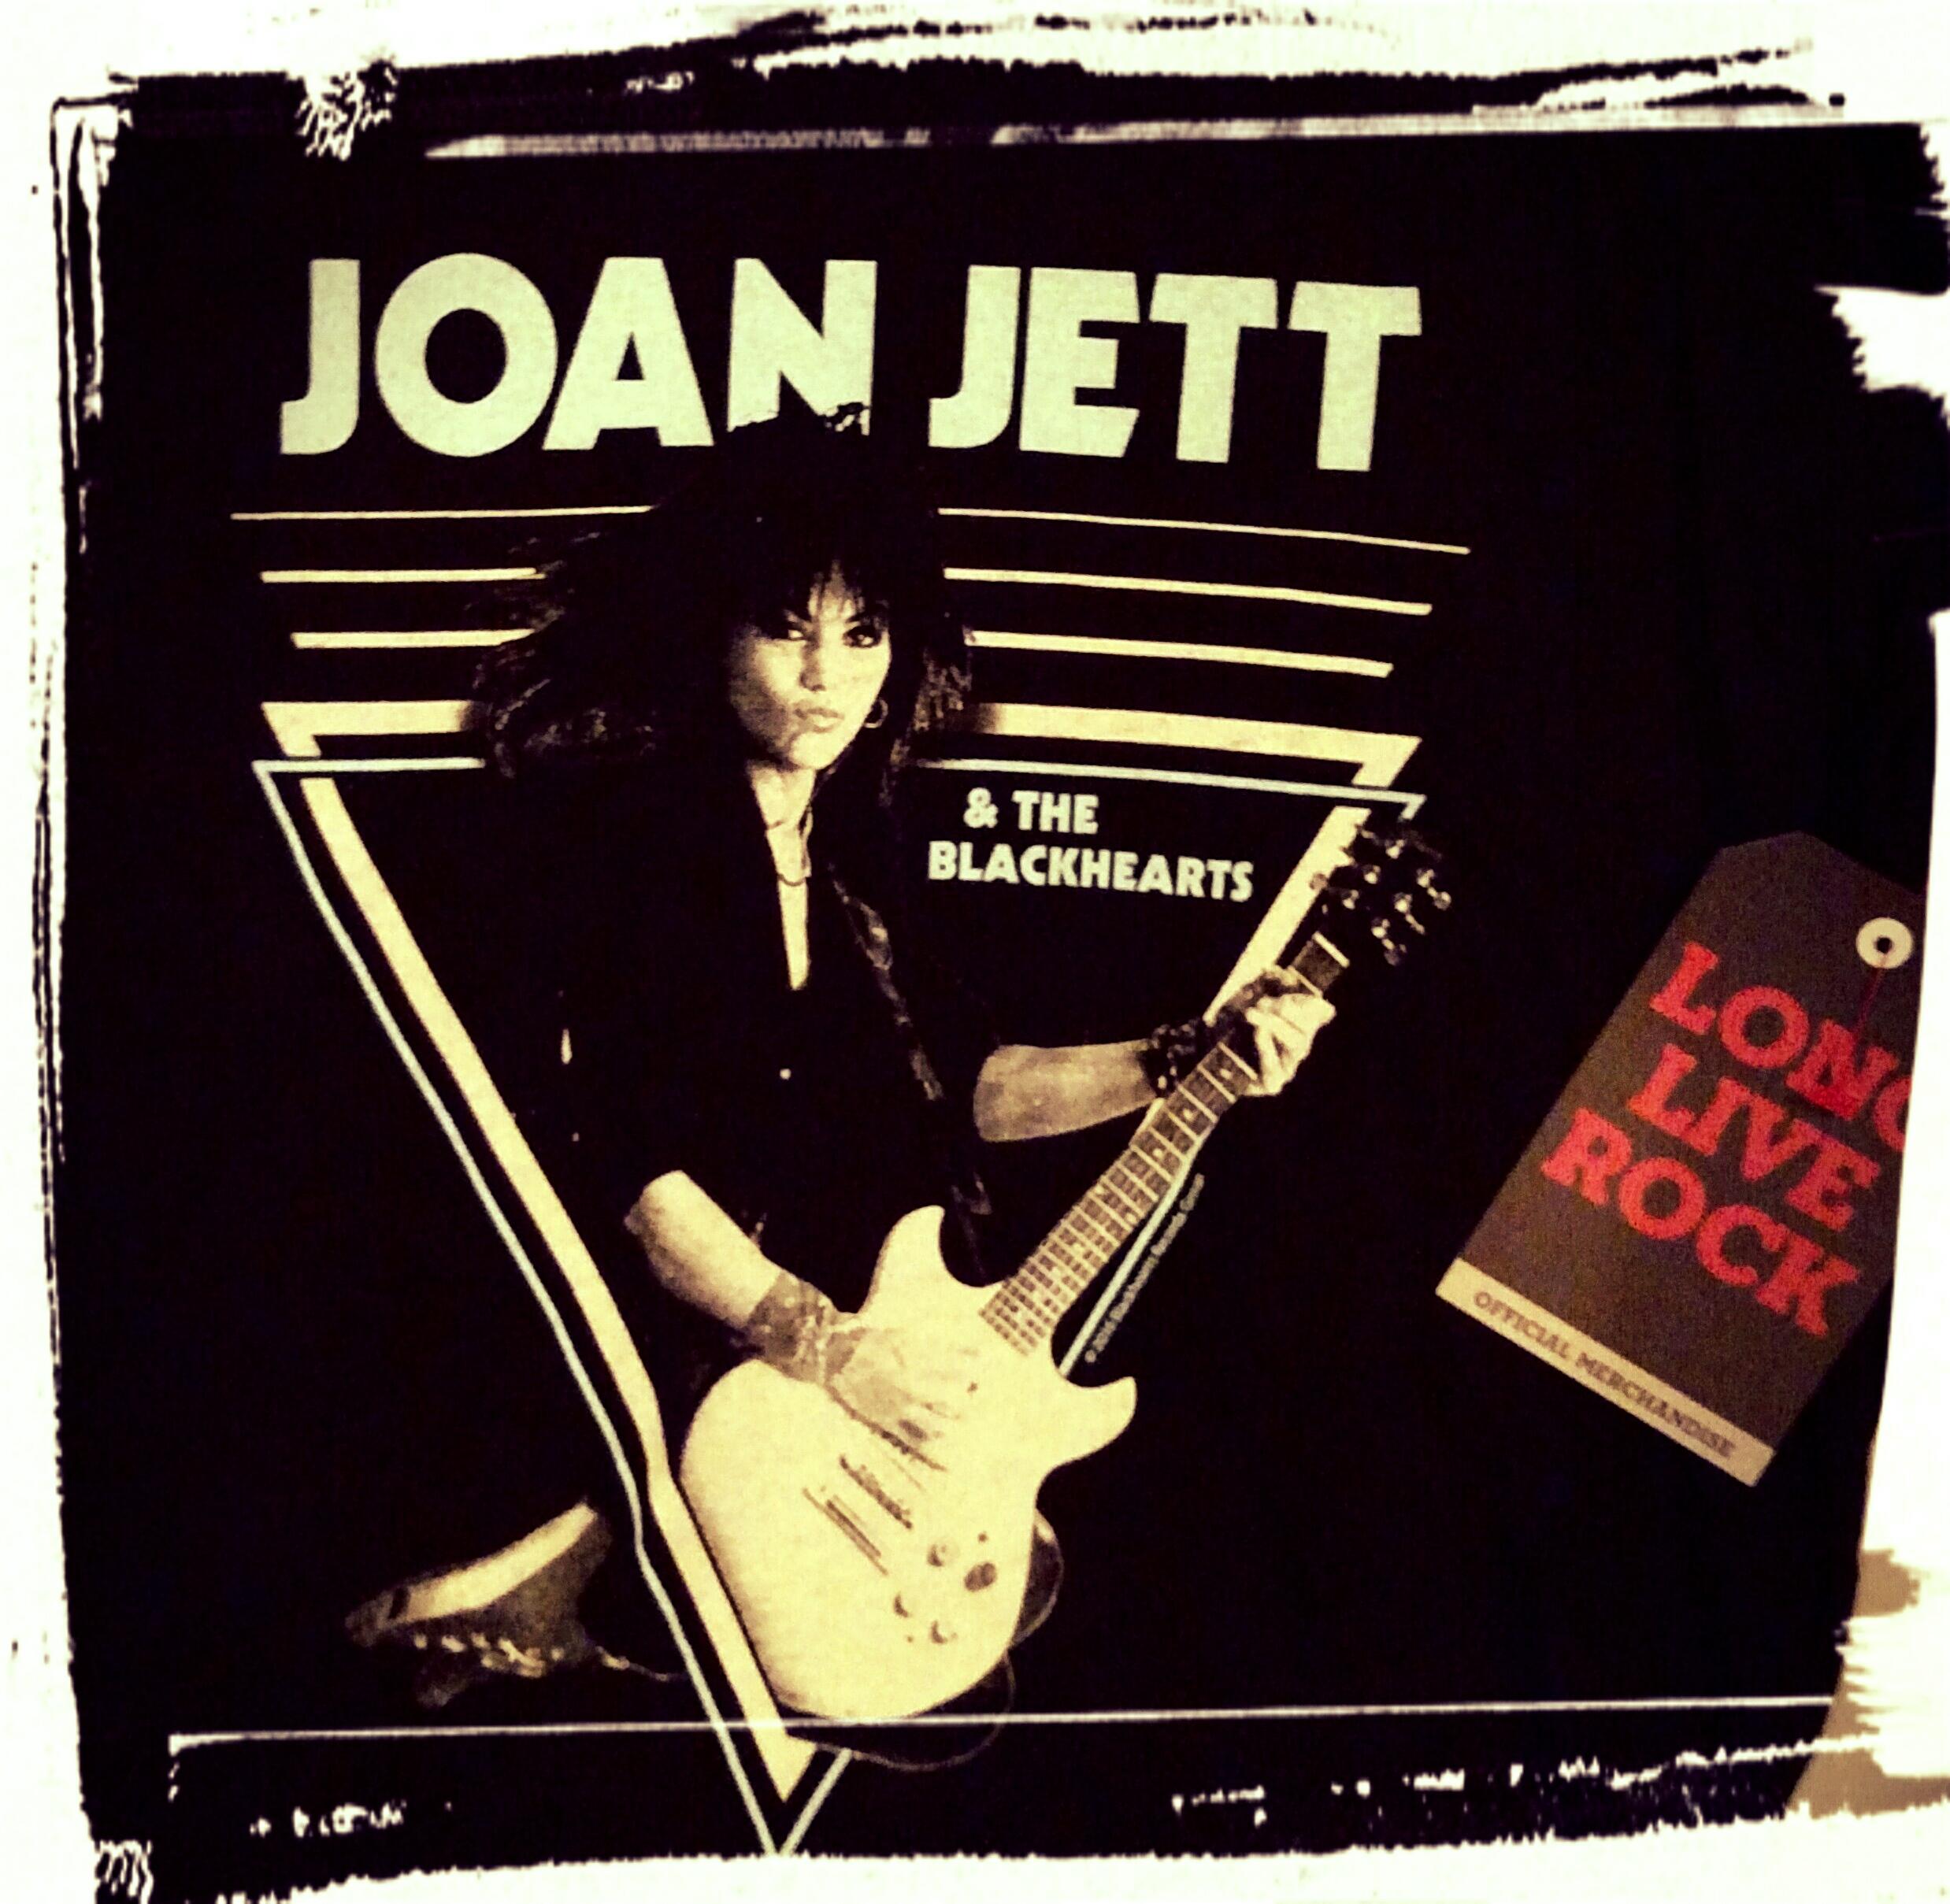 Joan Jett t-shirt front